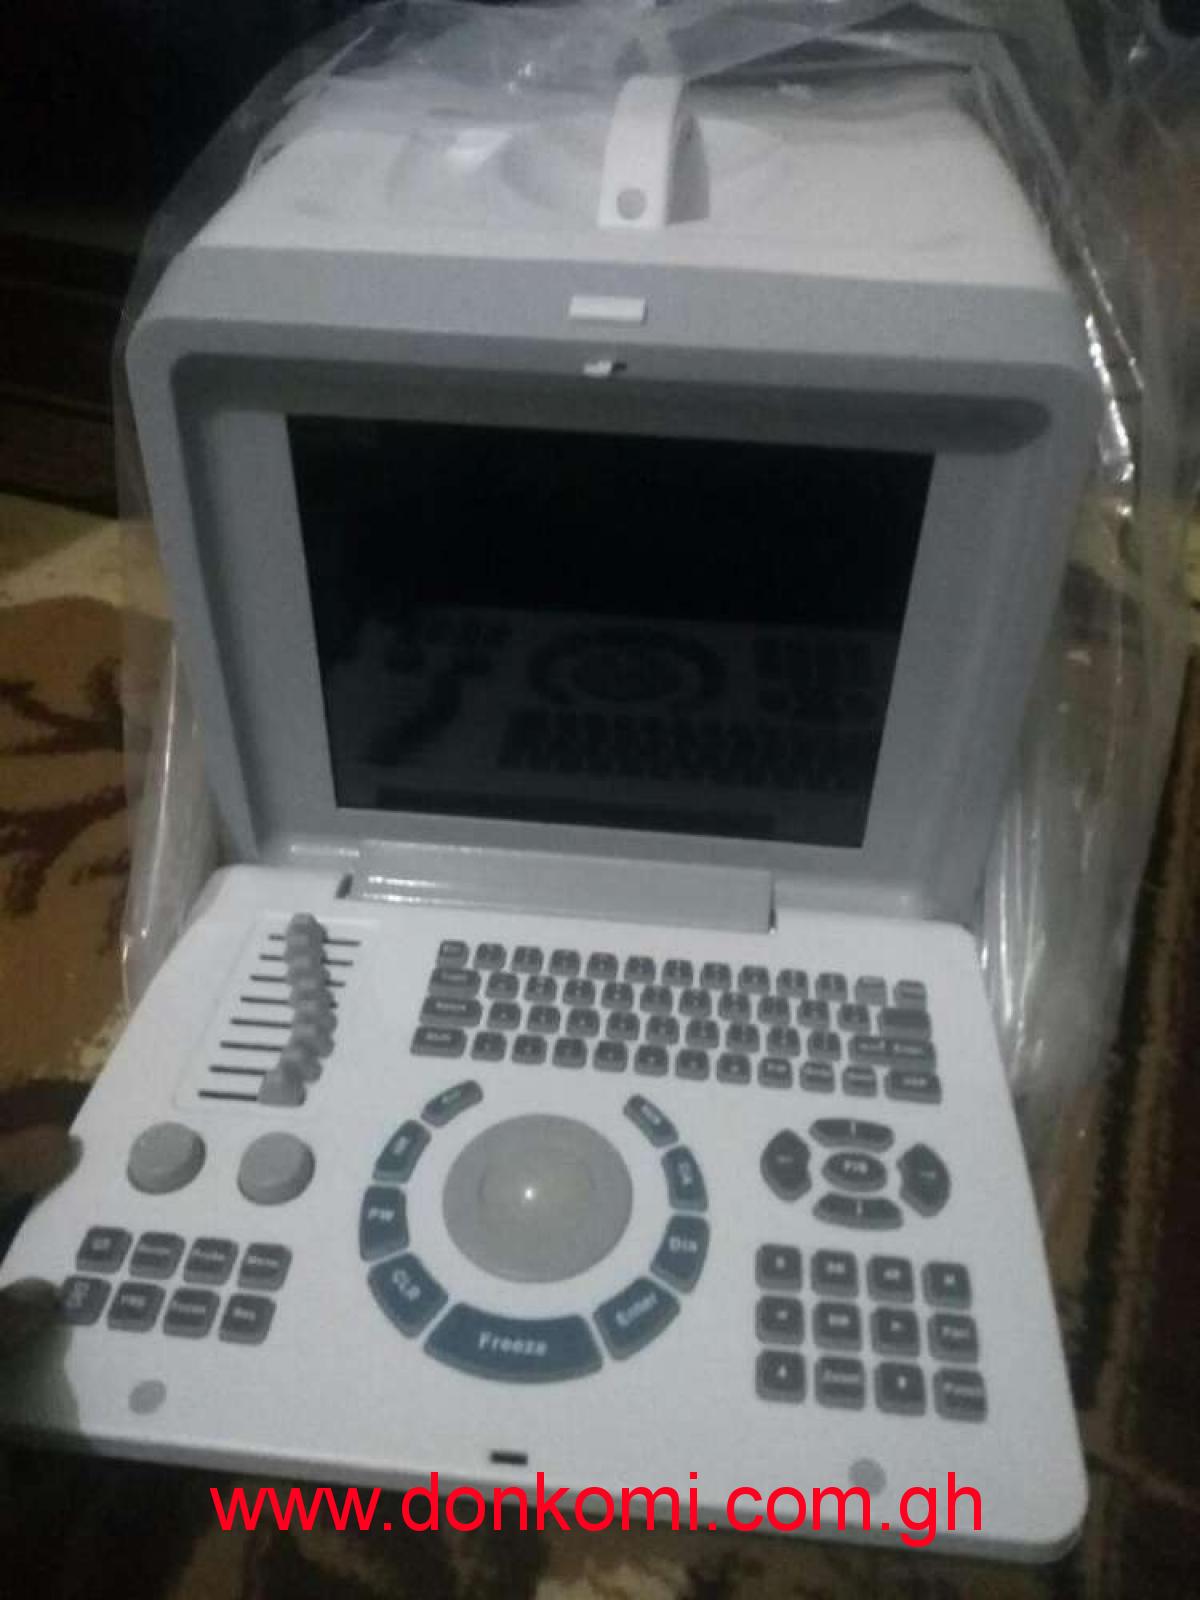 New Digital portable Ultrasound scan